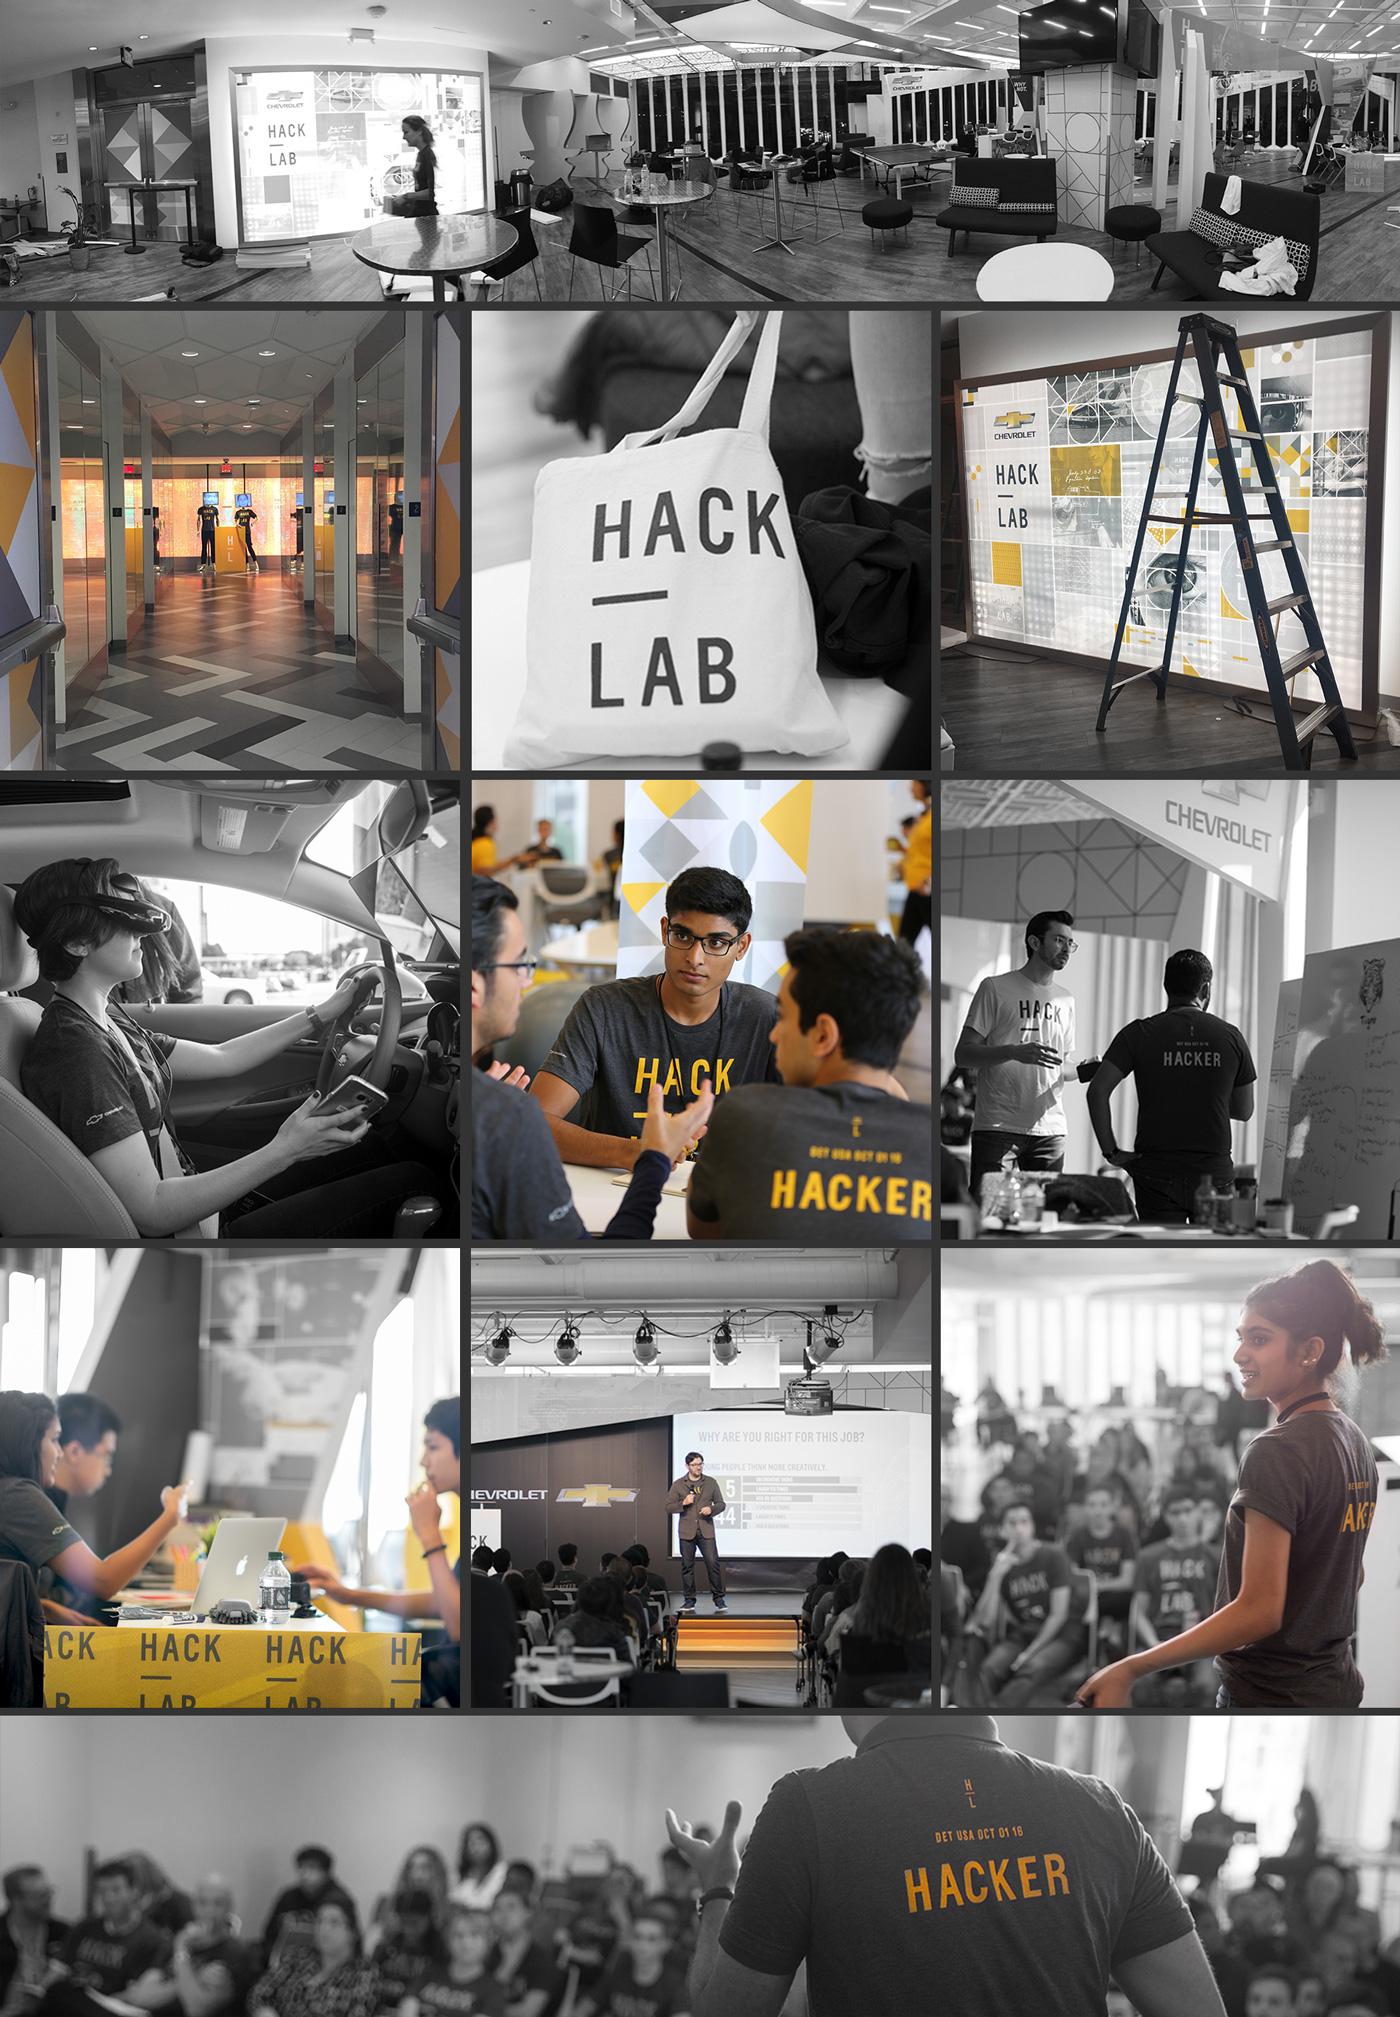 hack lab